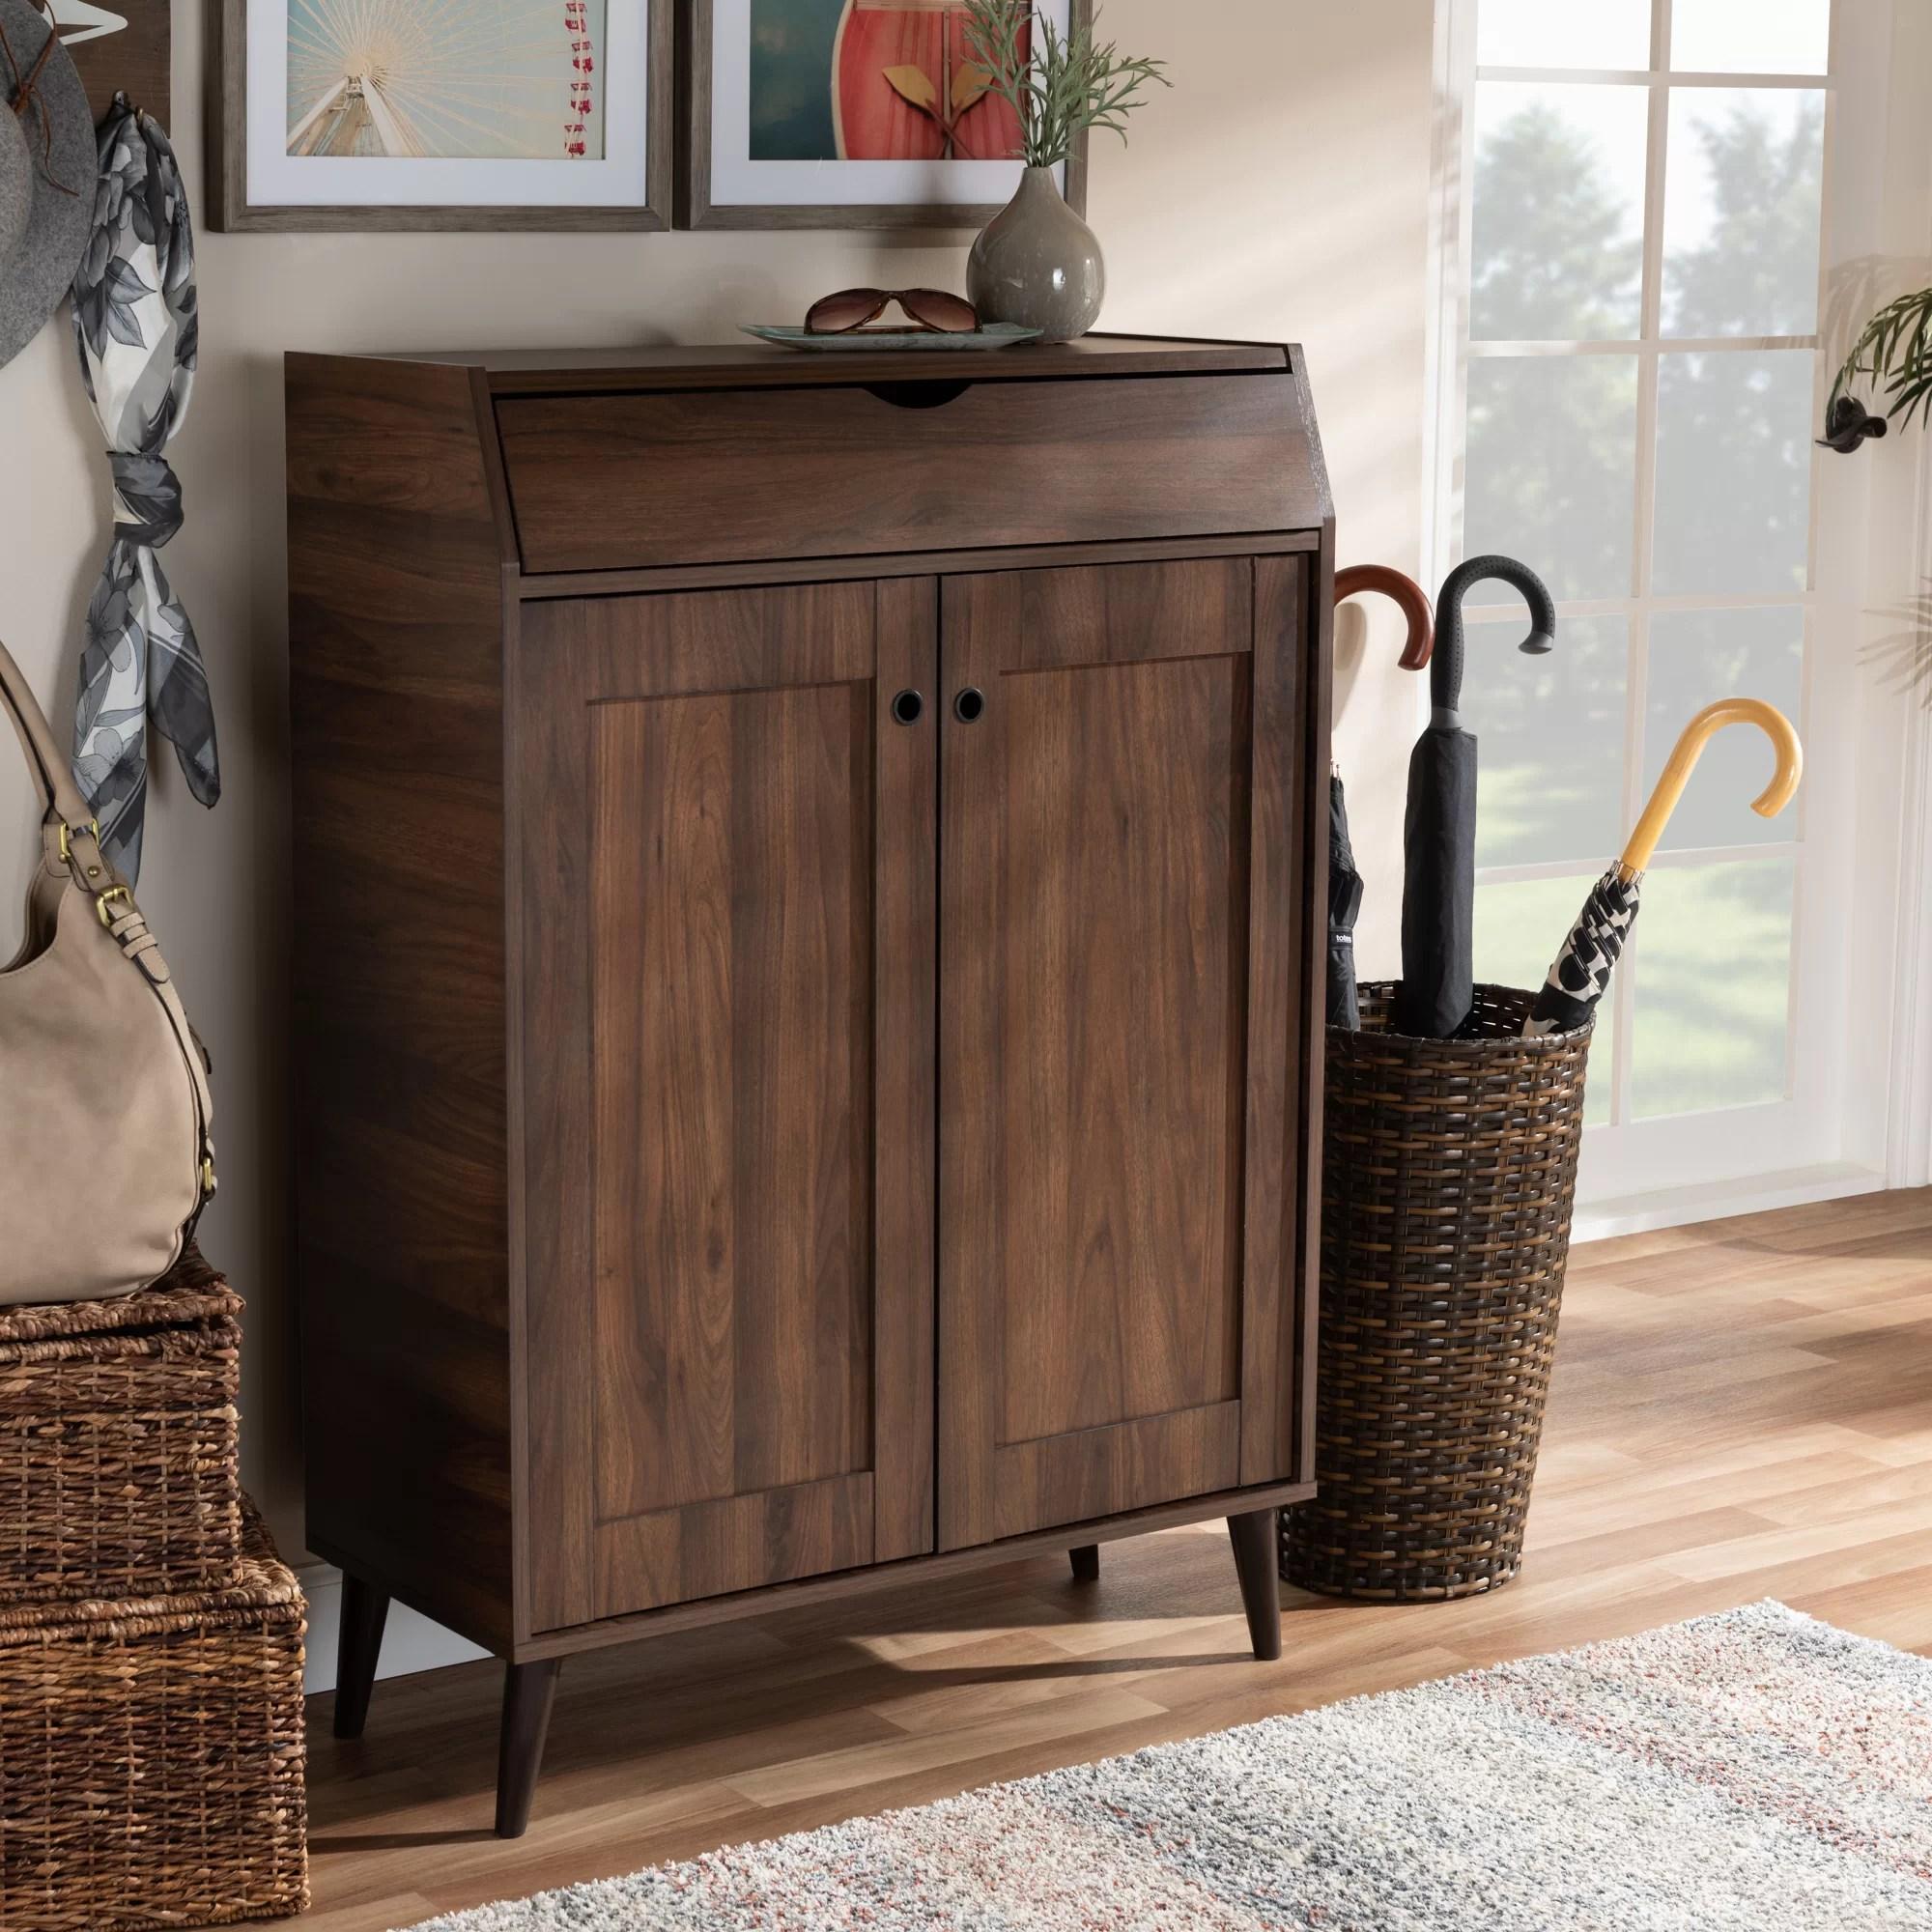 Cheap 2 Door Wood Entryway 10 Pair Shoe Storage Cabinet Furniture Online